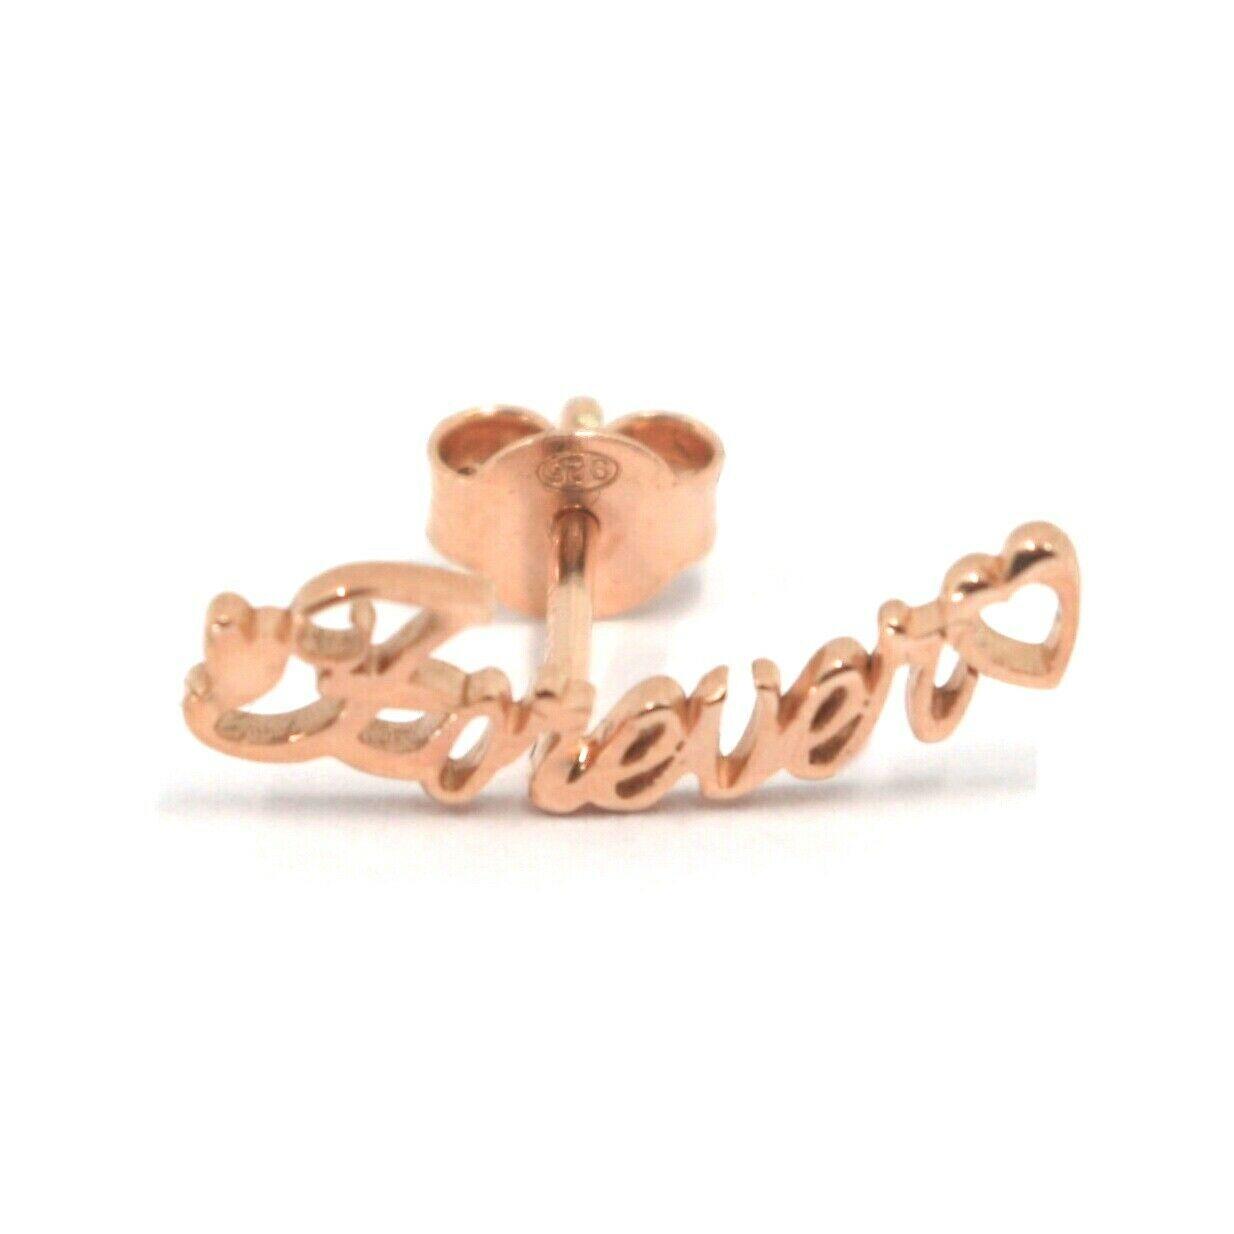 925 STERLING SILVER ROSE EARRINGS, WRITTEN FOREVER, HEART, MADE IN ITALY